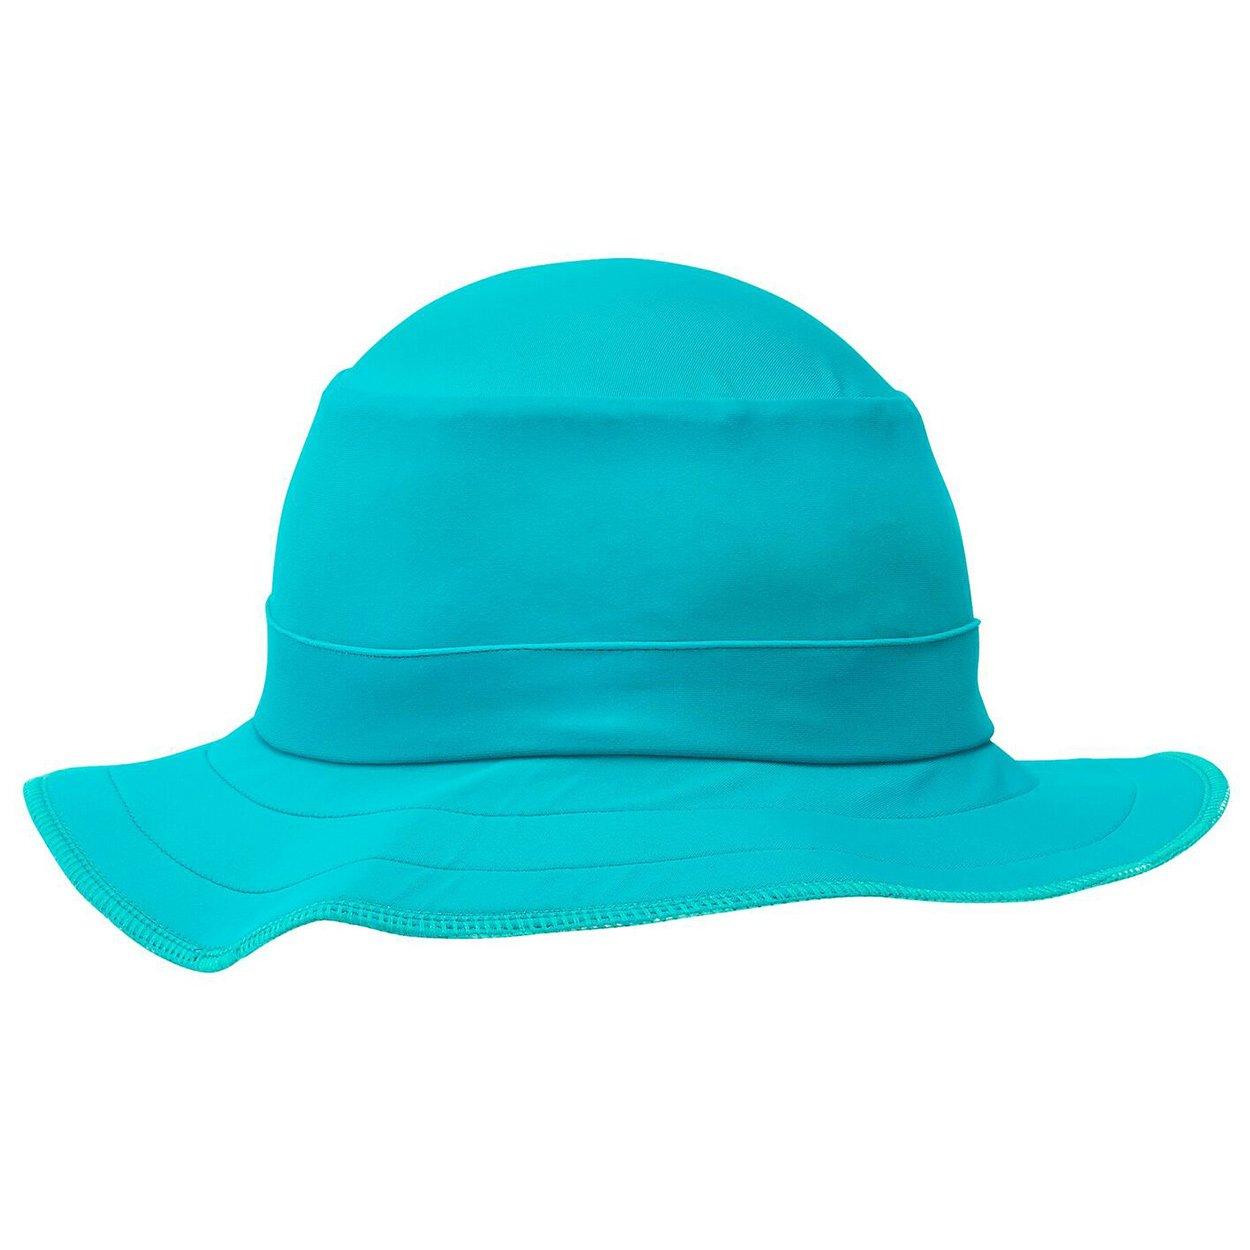 Aqua Funky Bucket Hat Upf 50+